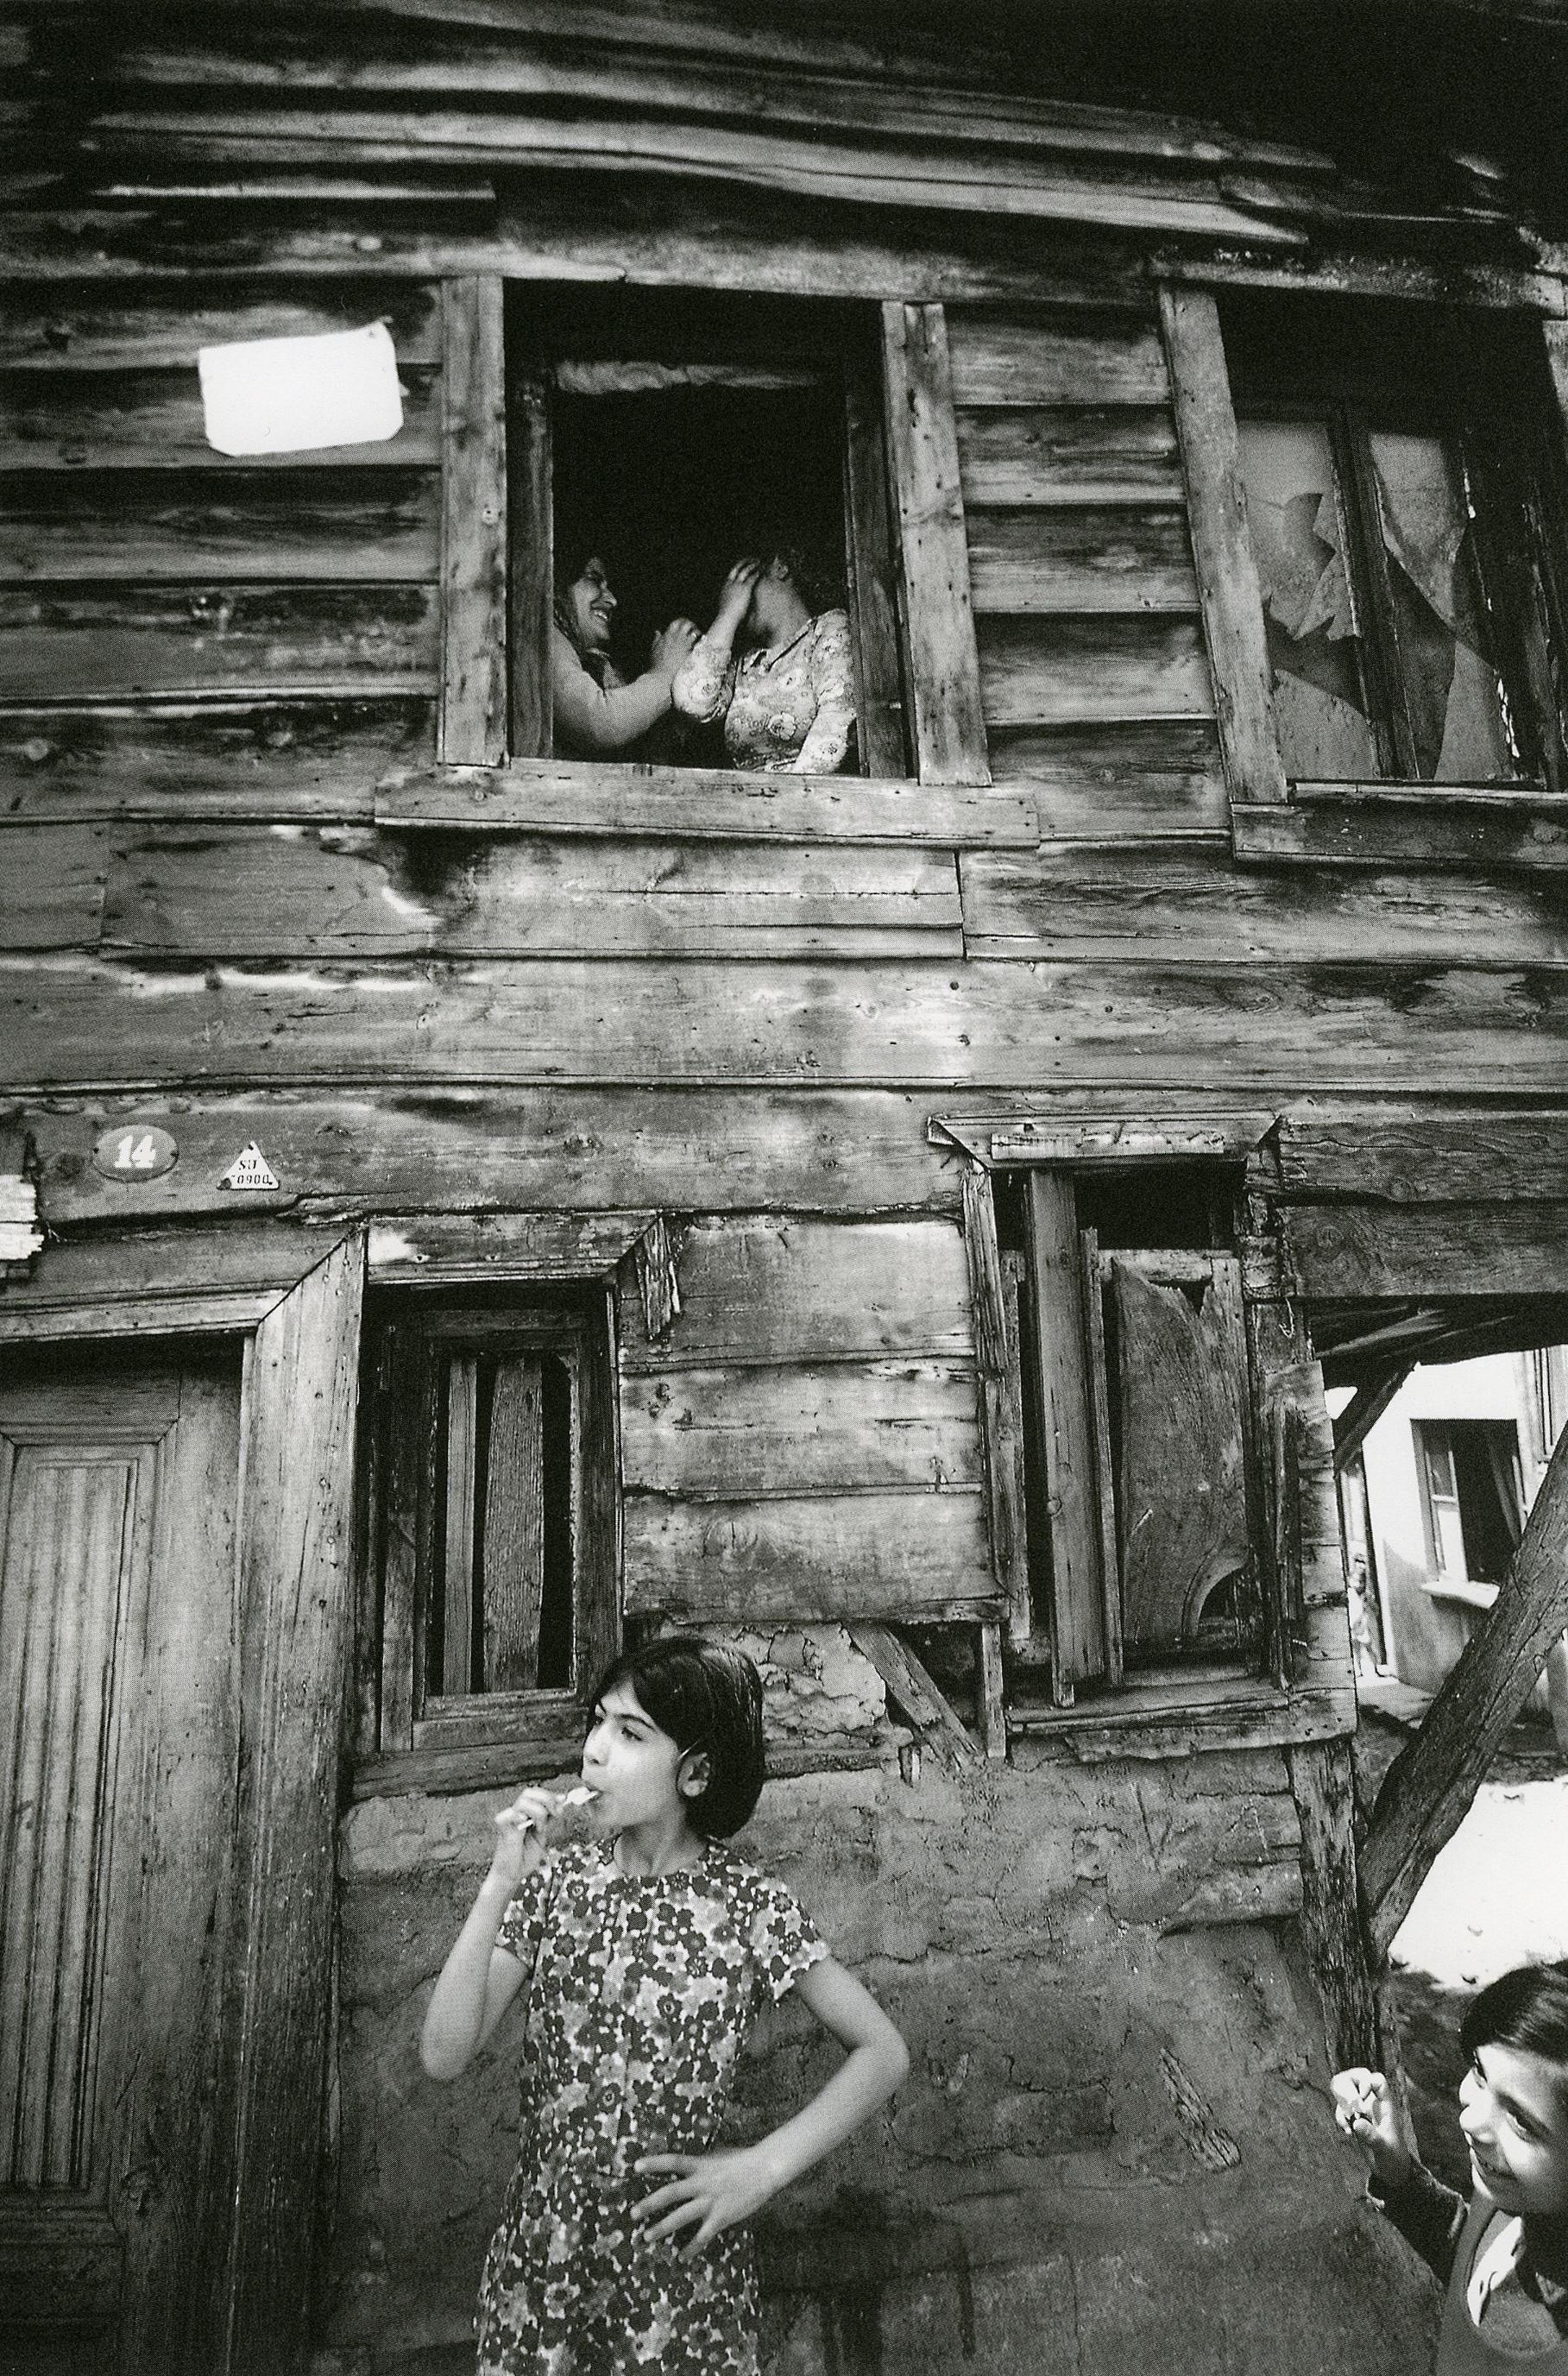 Guler_Zeyrek, Fatih, 1982_p145